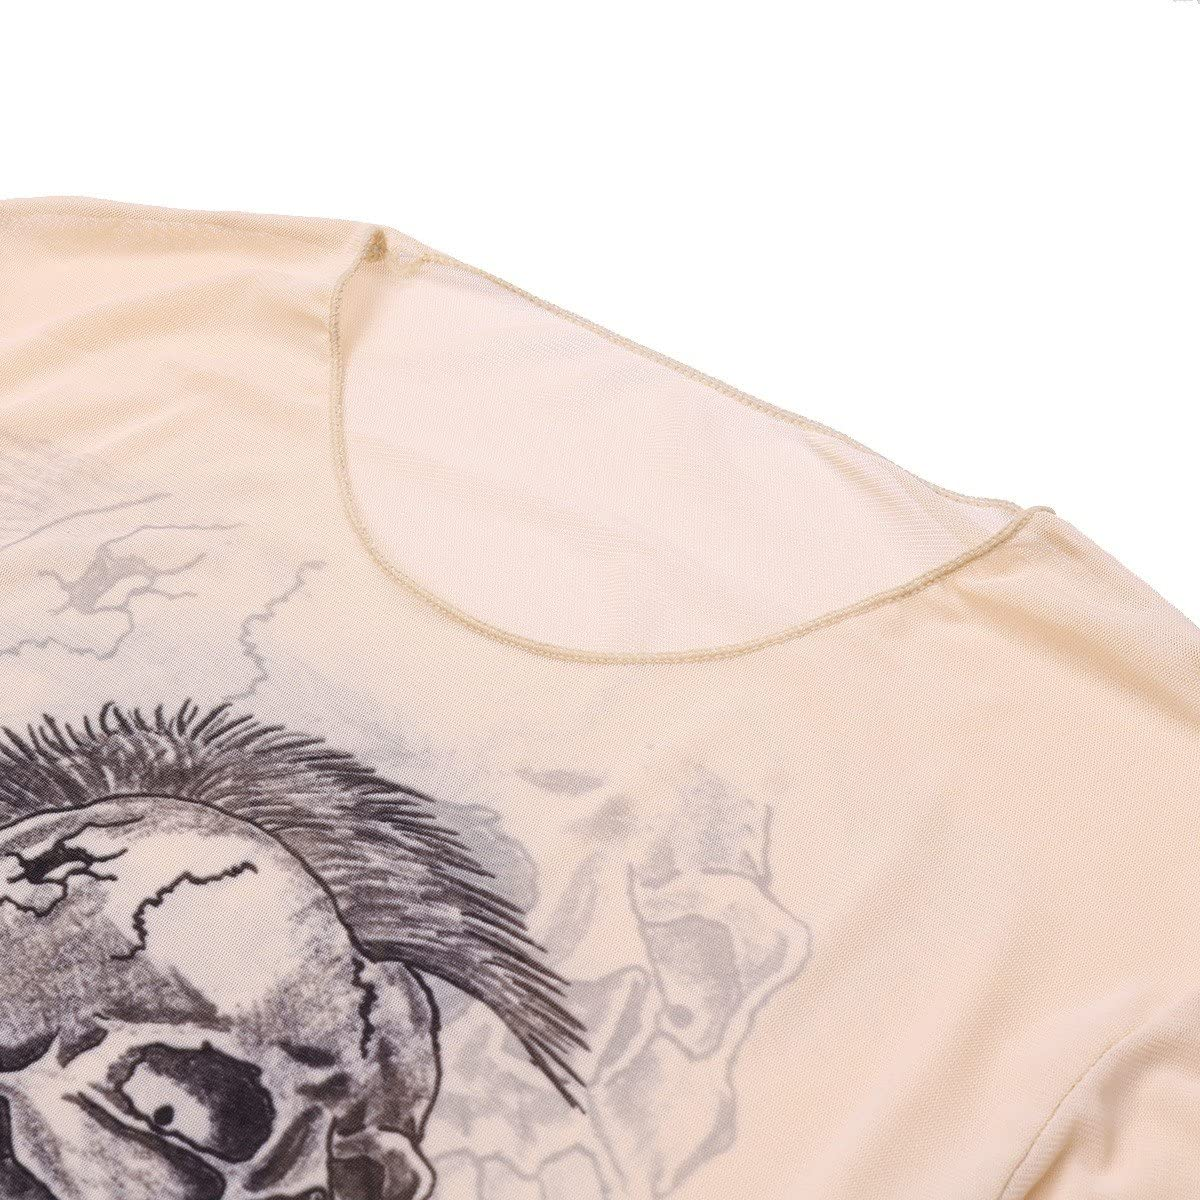 Tiaobug Männer Tattoo-Shirt transparent Herren Langarmshirt Slim Fit Tattoos Unterhemd Unterwäsche